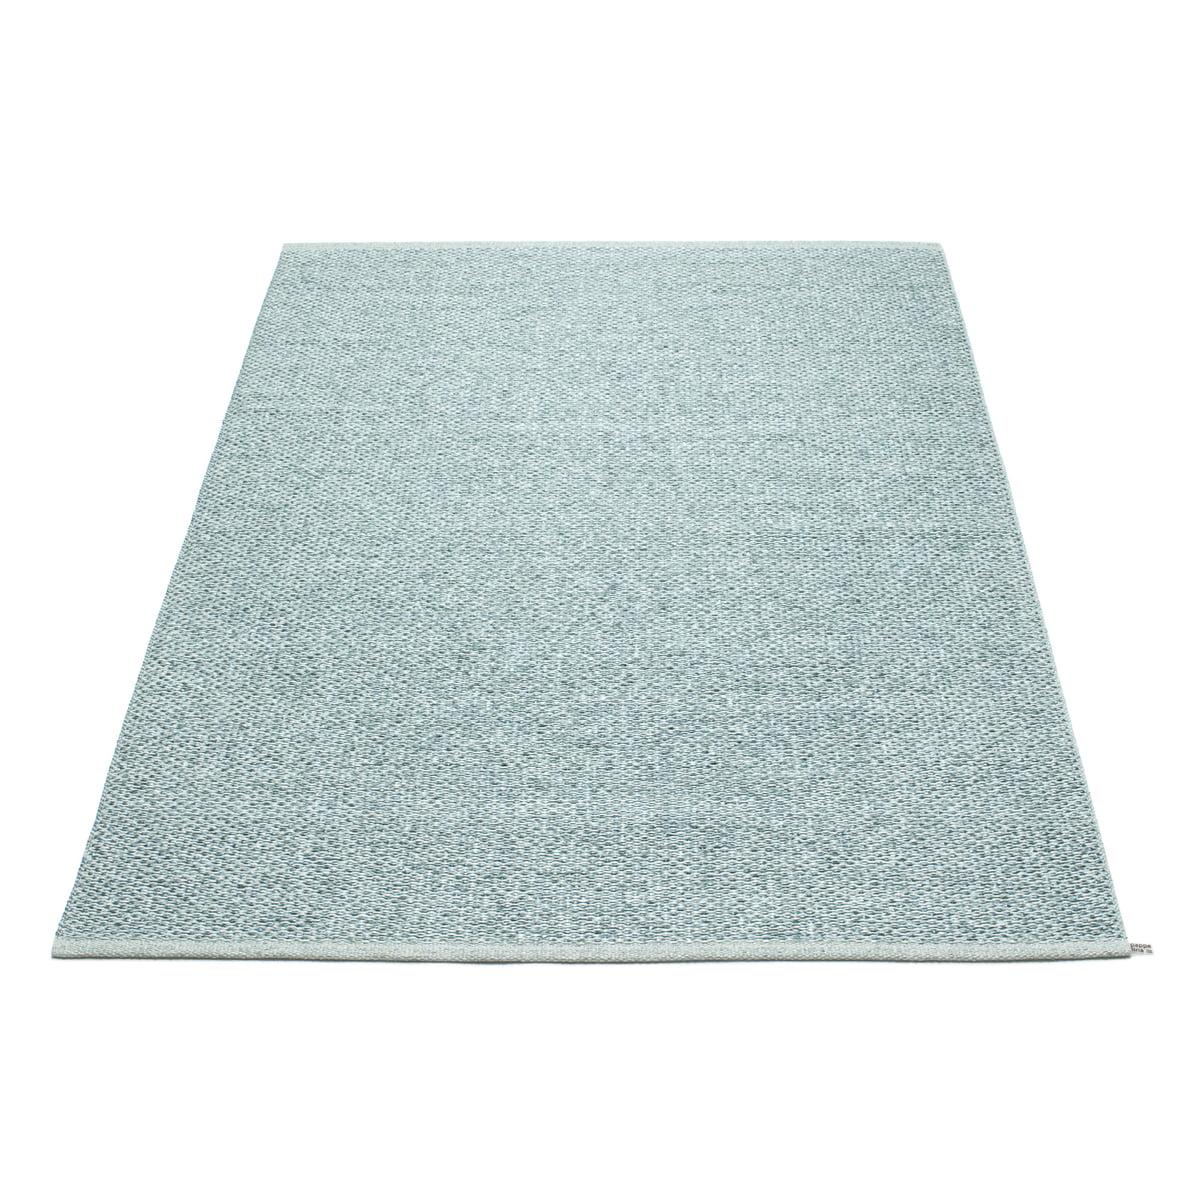 pappelina svea teppich 140 x 220 cm azurblue metallic pale turquois azurblau t 140 h 0 b. Black Bedroom Furniture Sets. Home Design Ideas